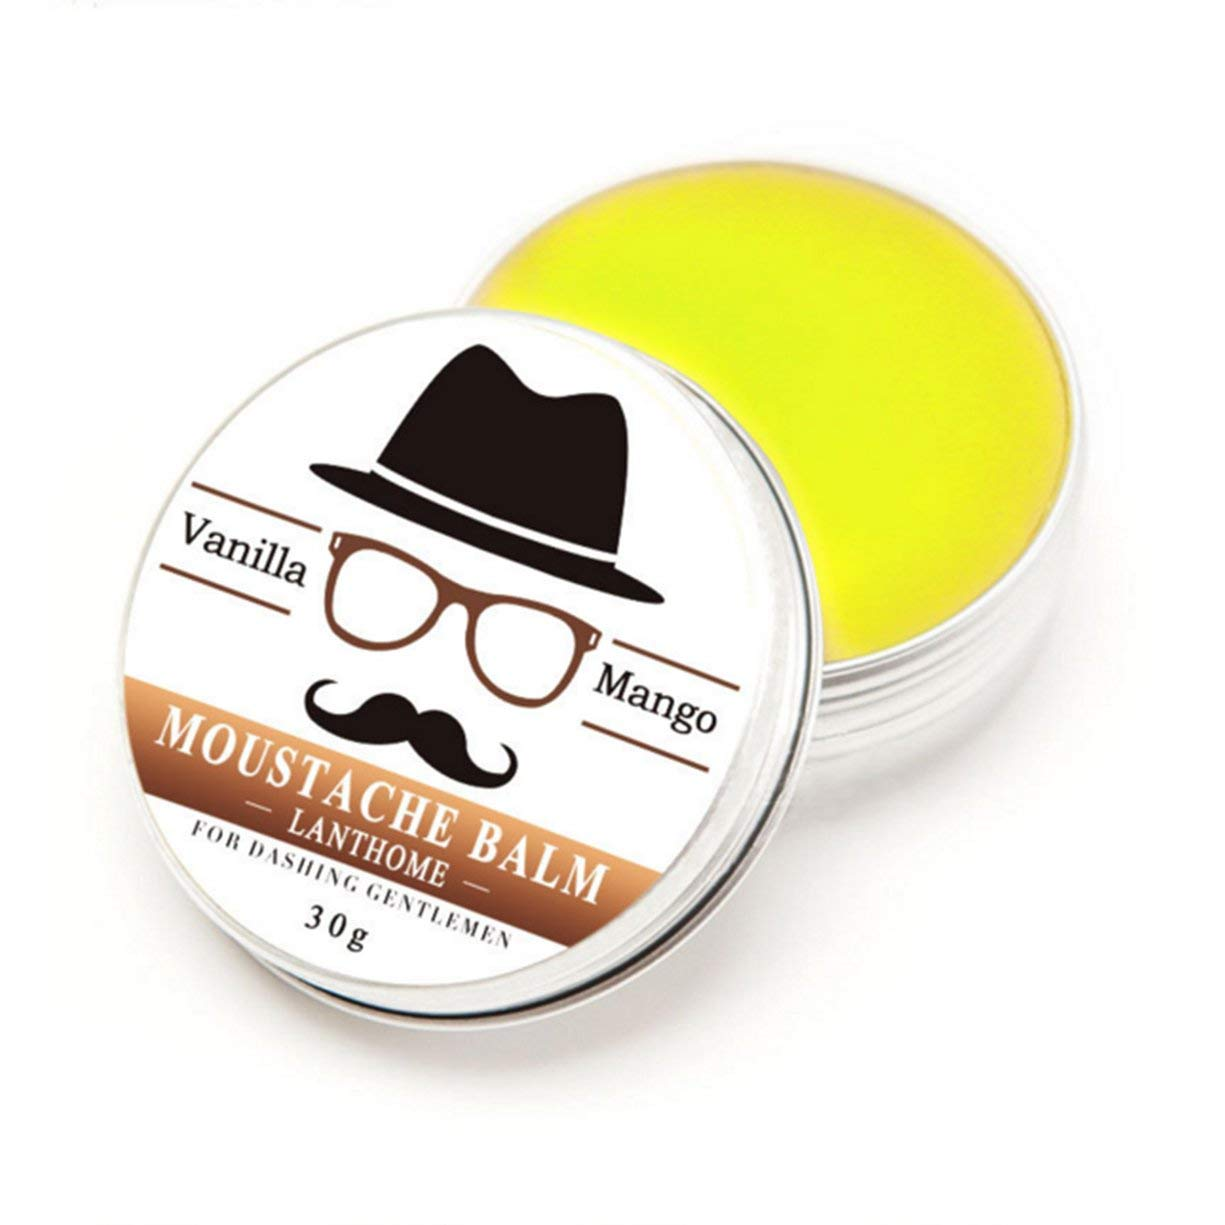 Balsamo alla moda Balsamo Balsamo alla moda Balsamo alla cera 100% naturale alla moda Cera d'api Birra idratante Mango profumato Detectoy